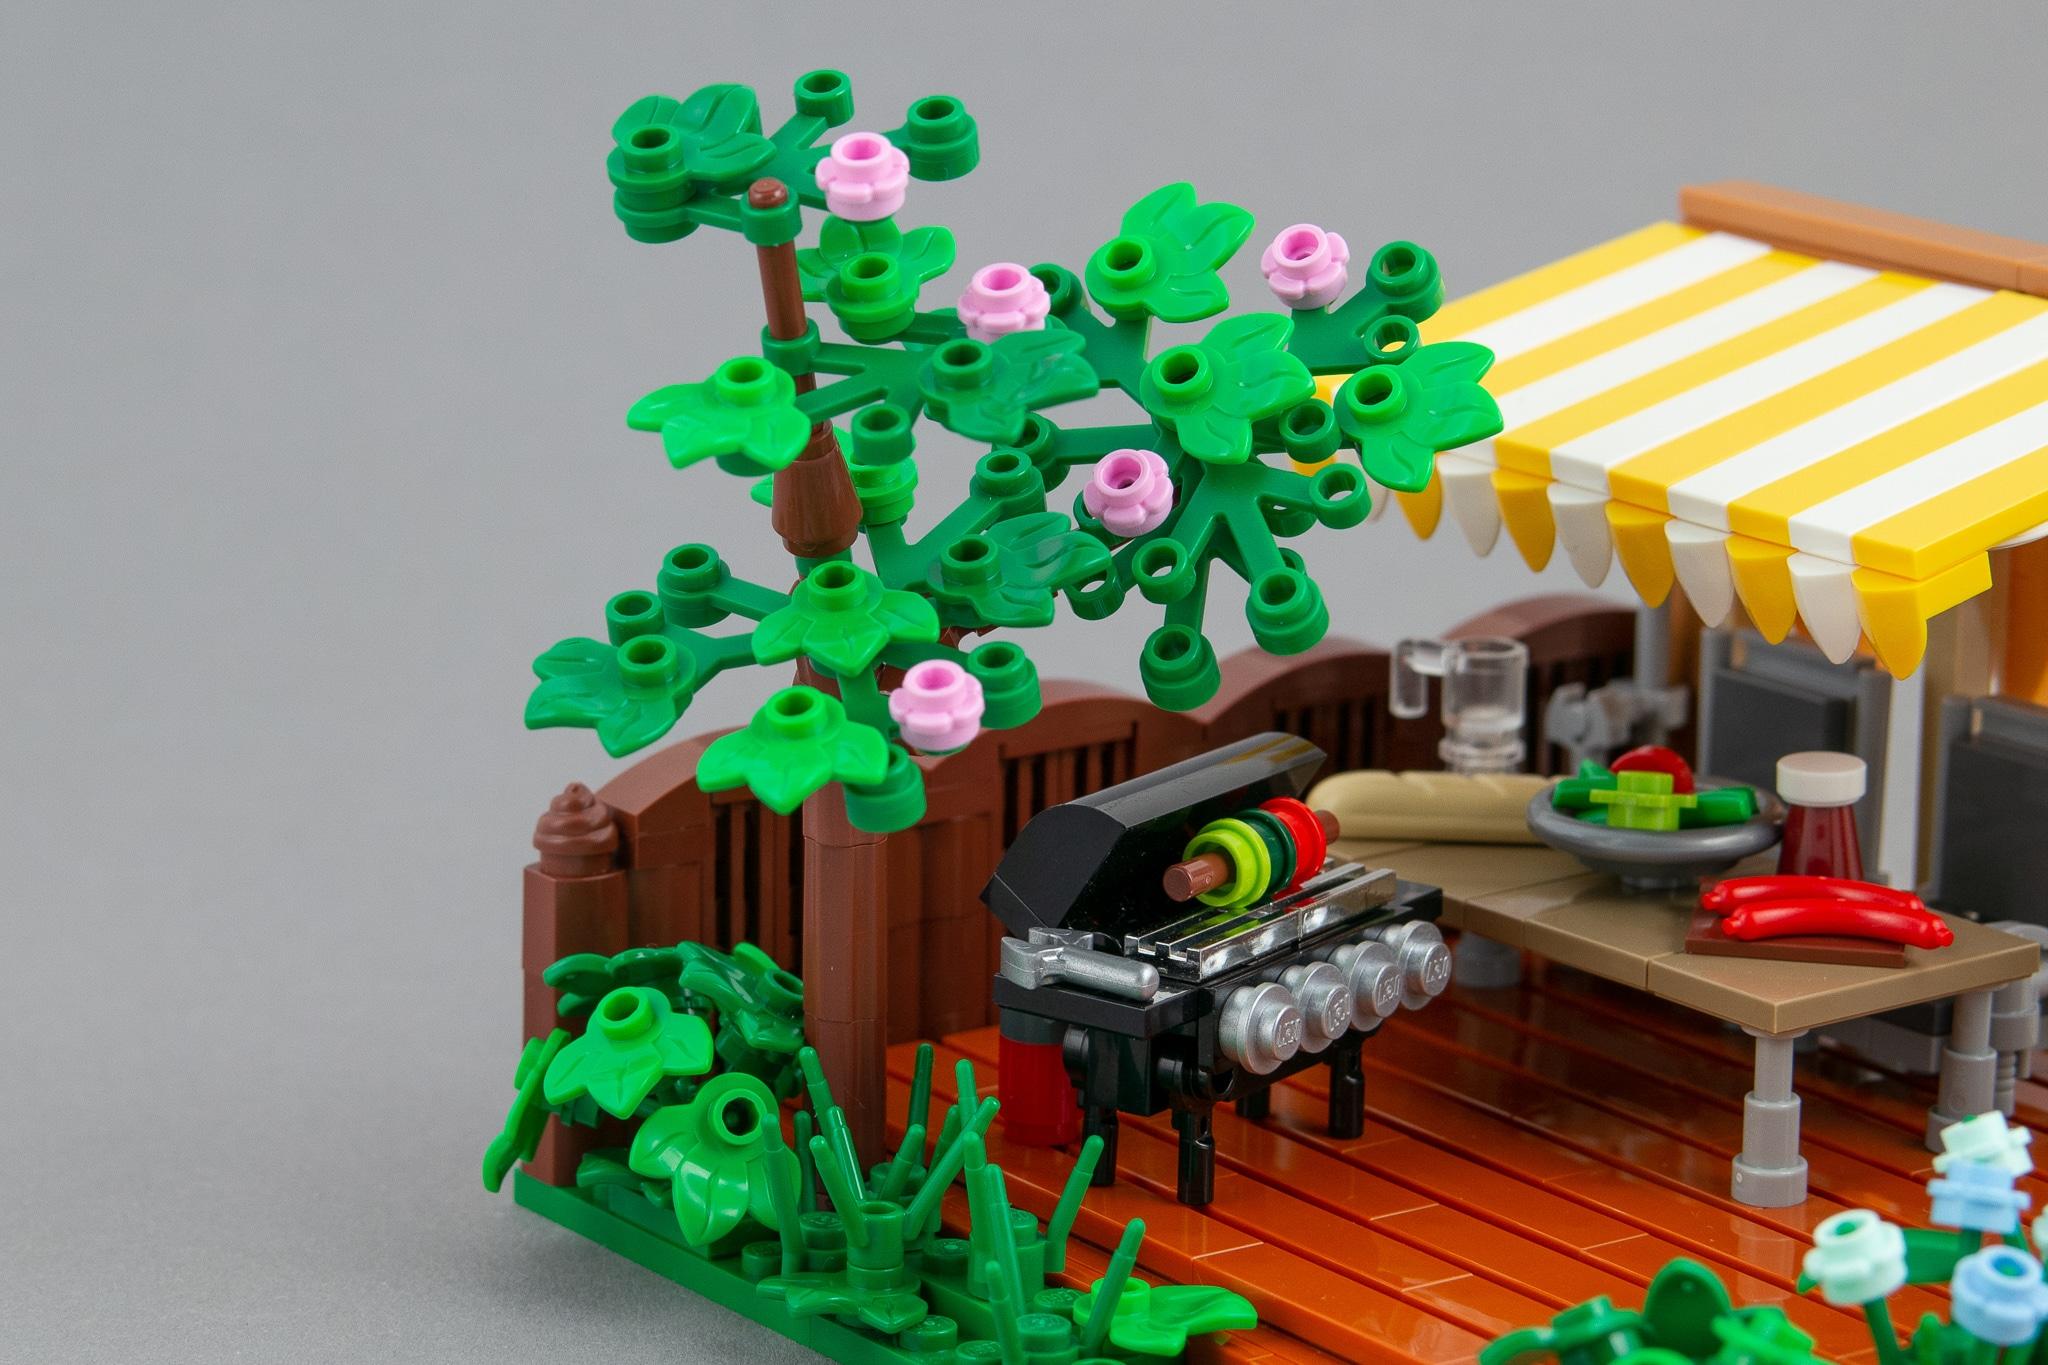 LEGO Terrasse Moc Grillen (7)